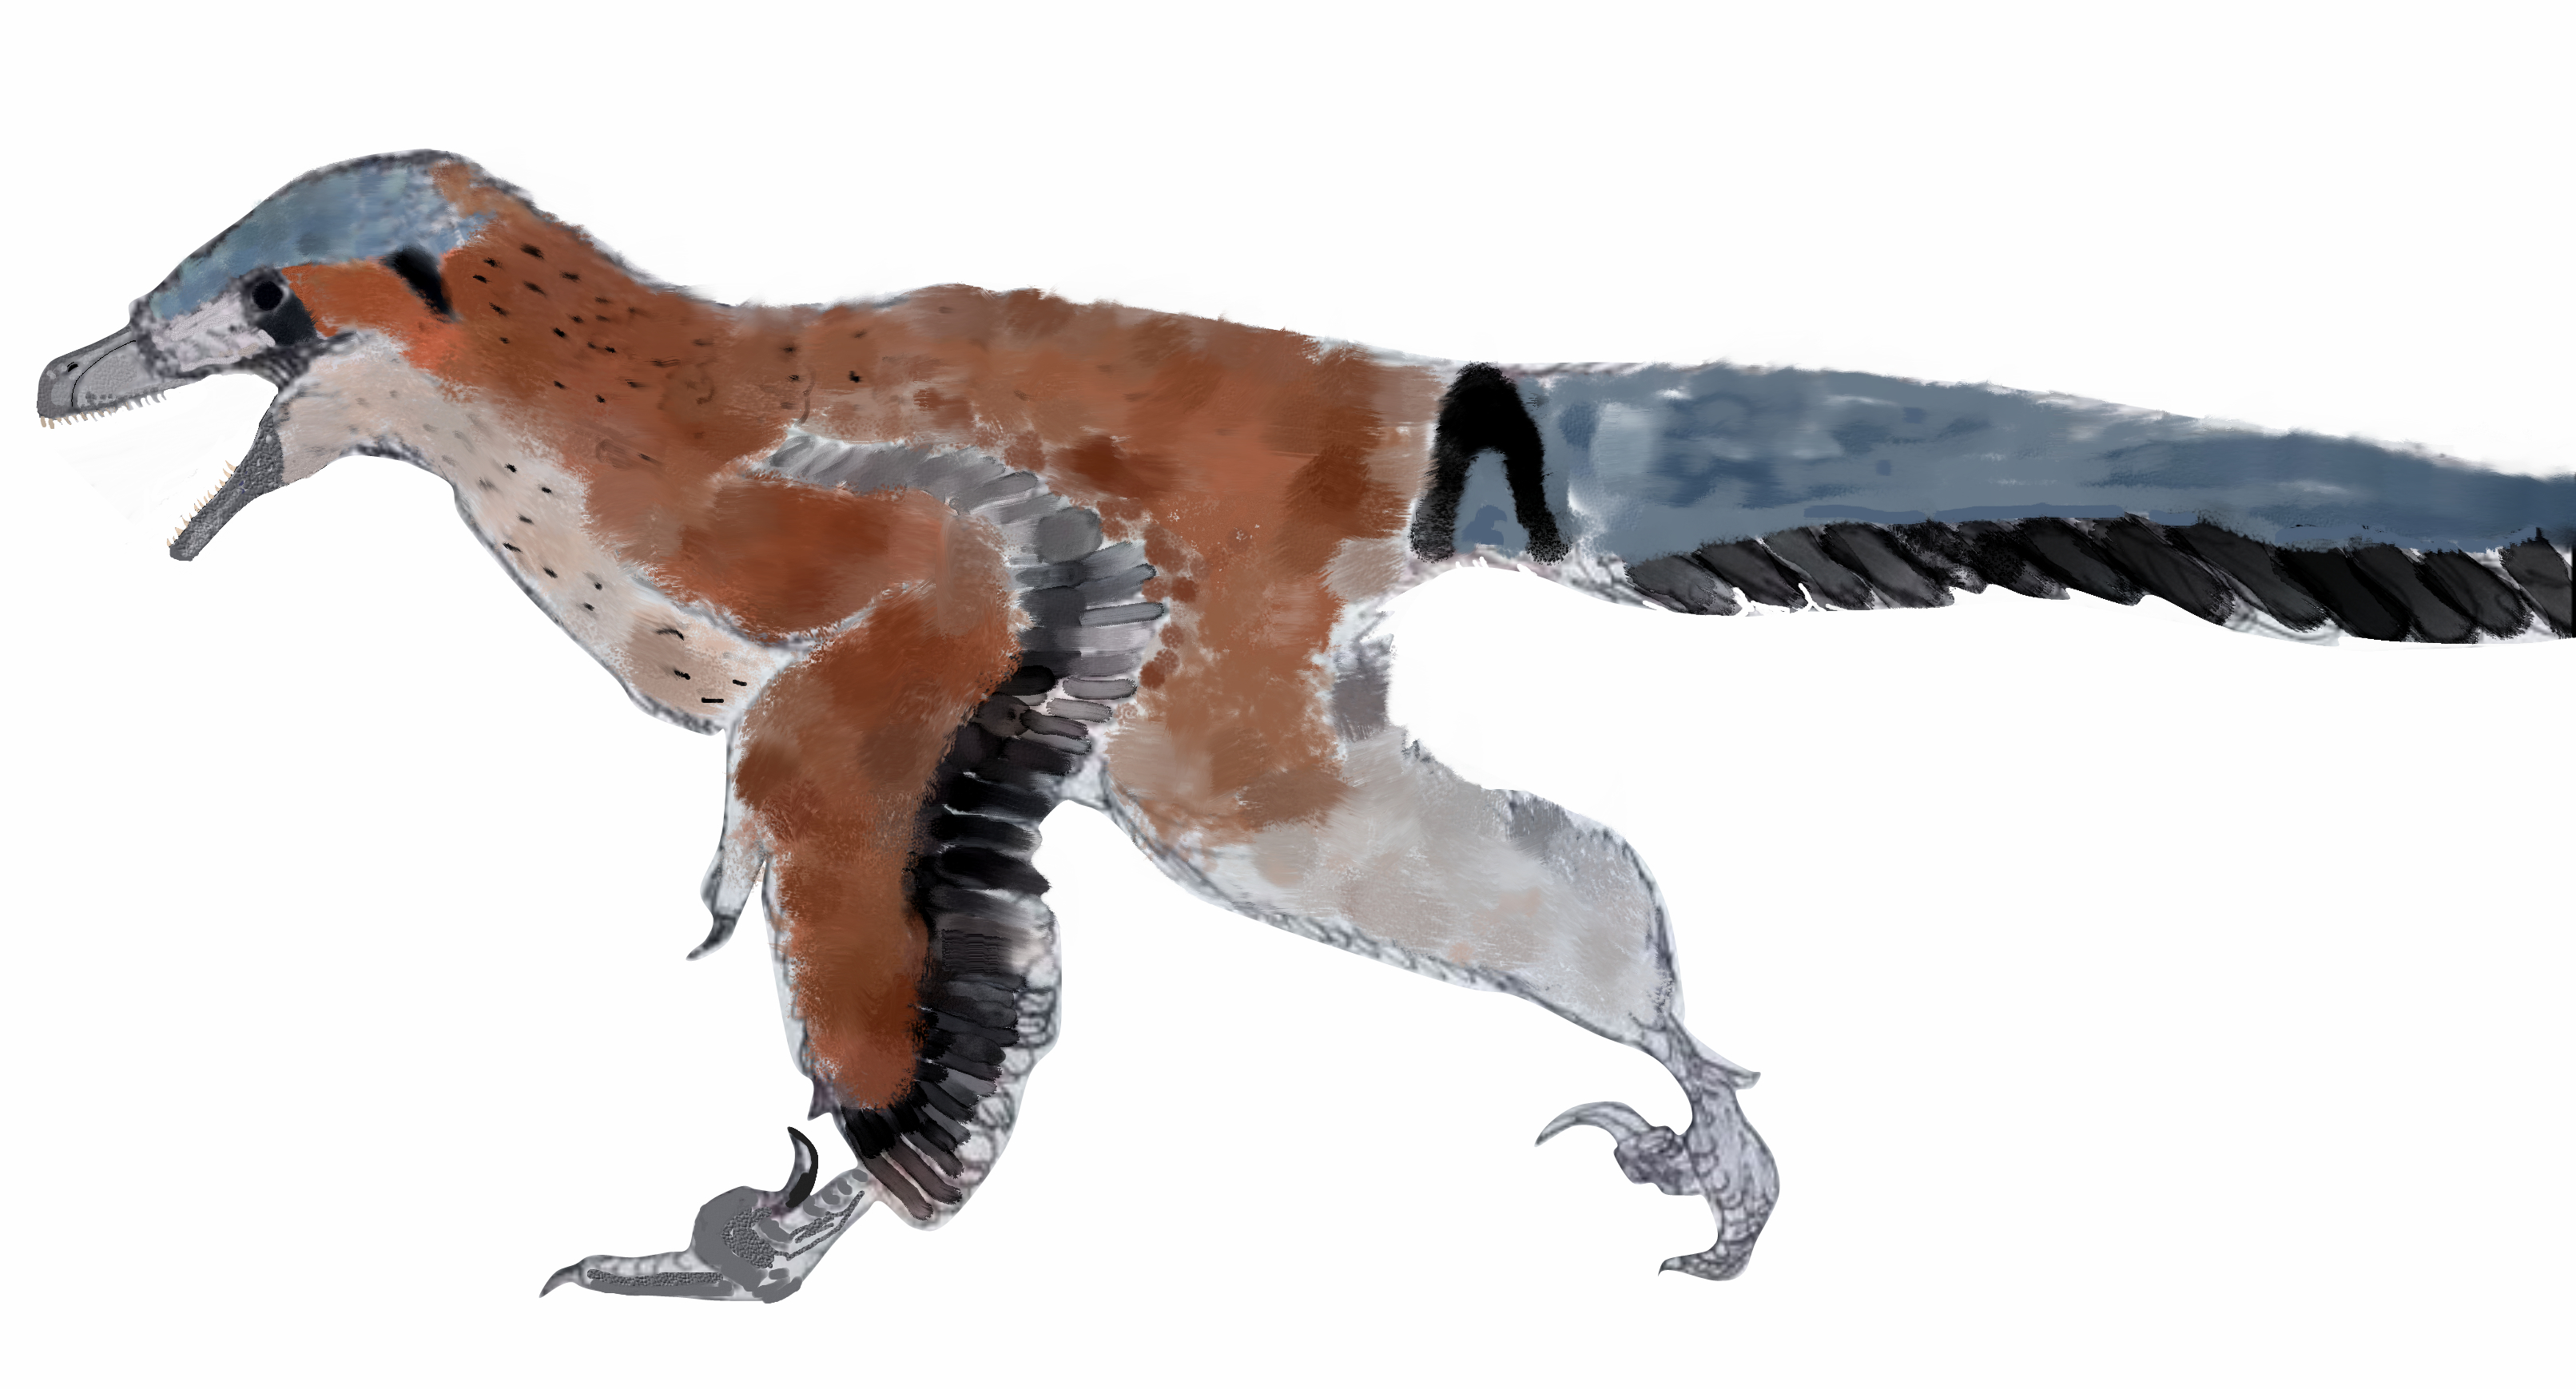 Ornithodesmus